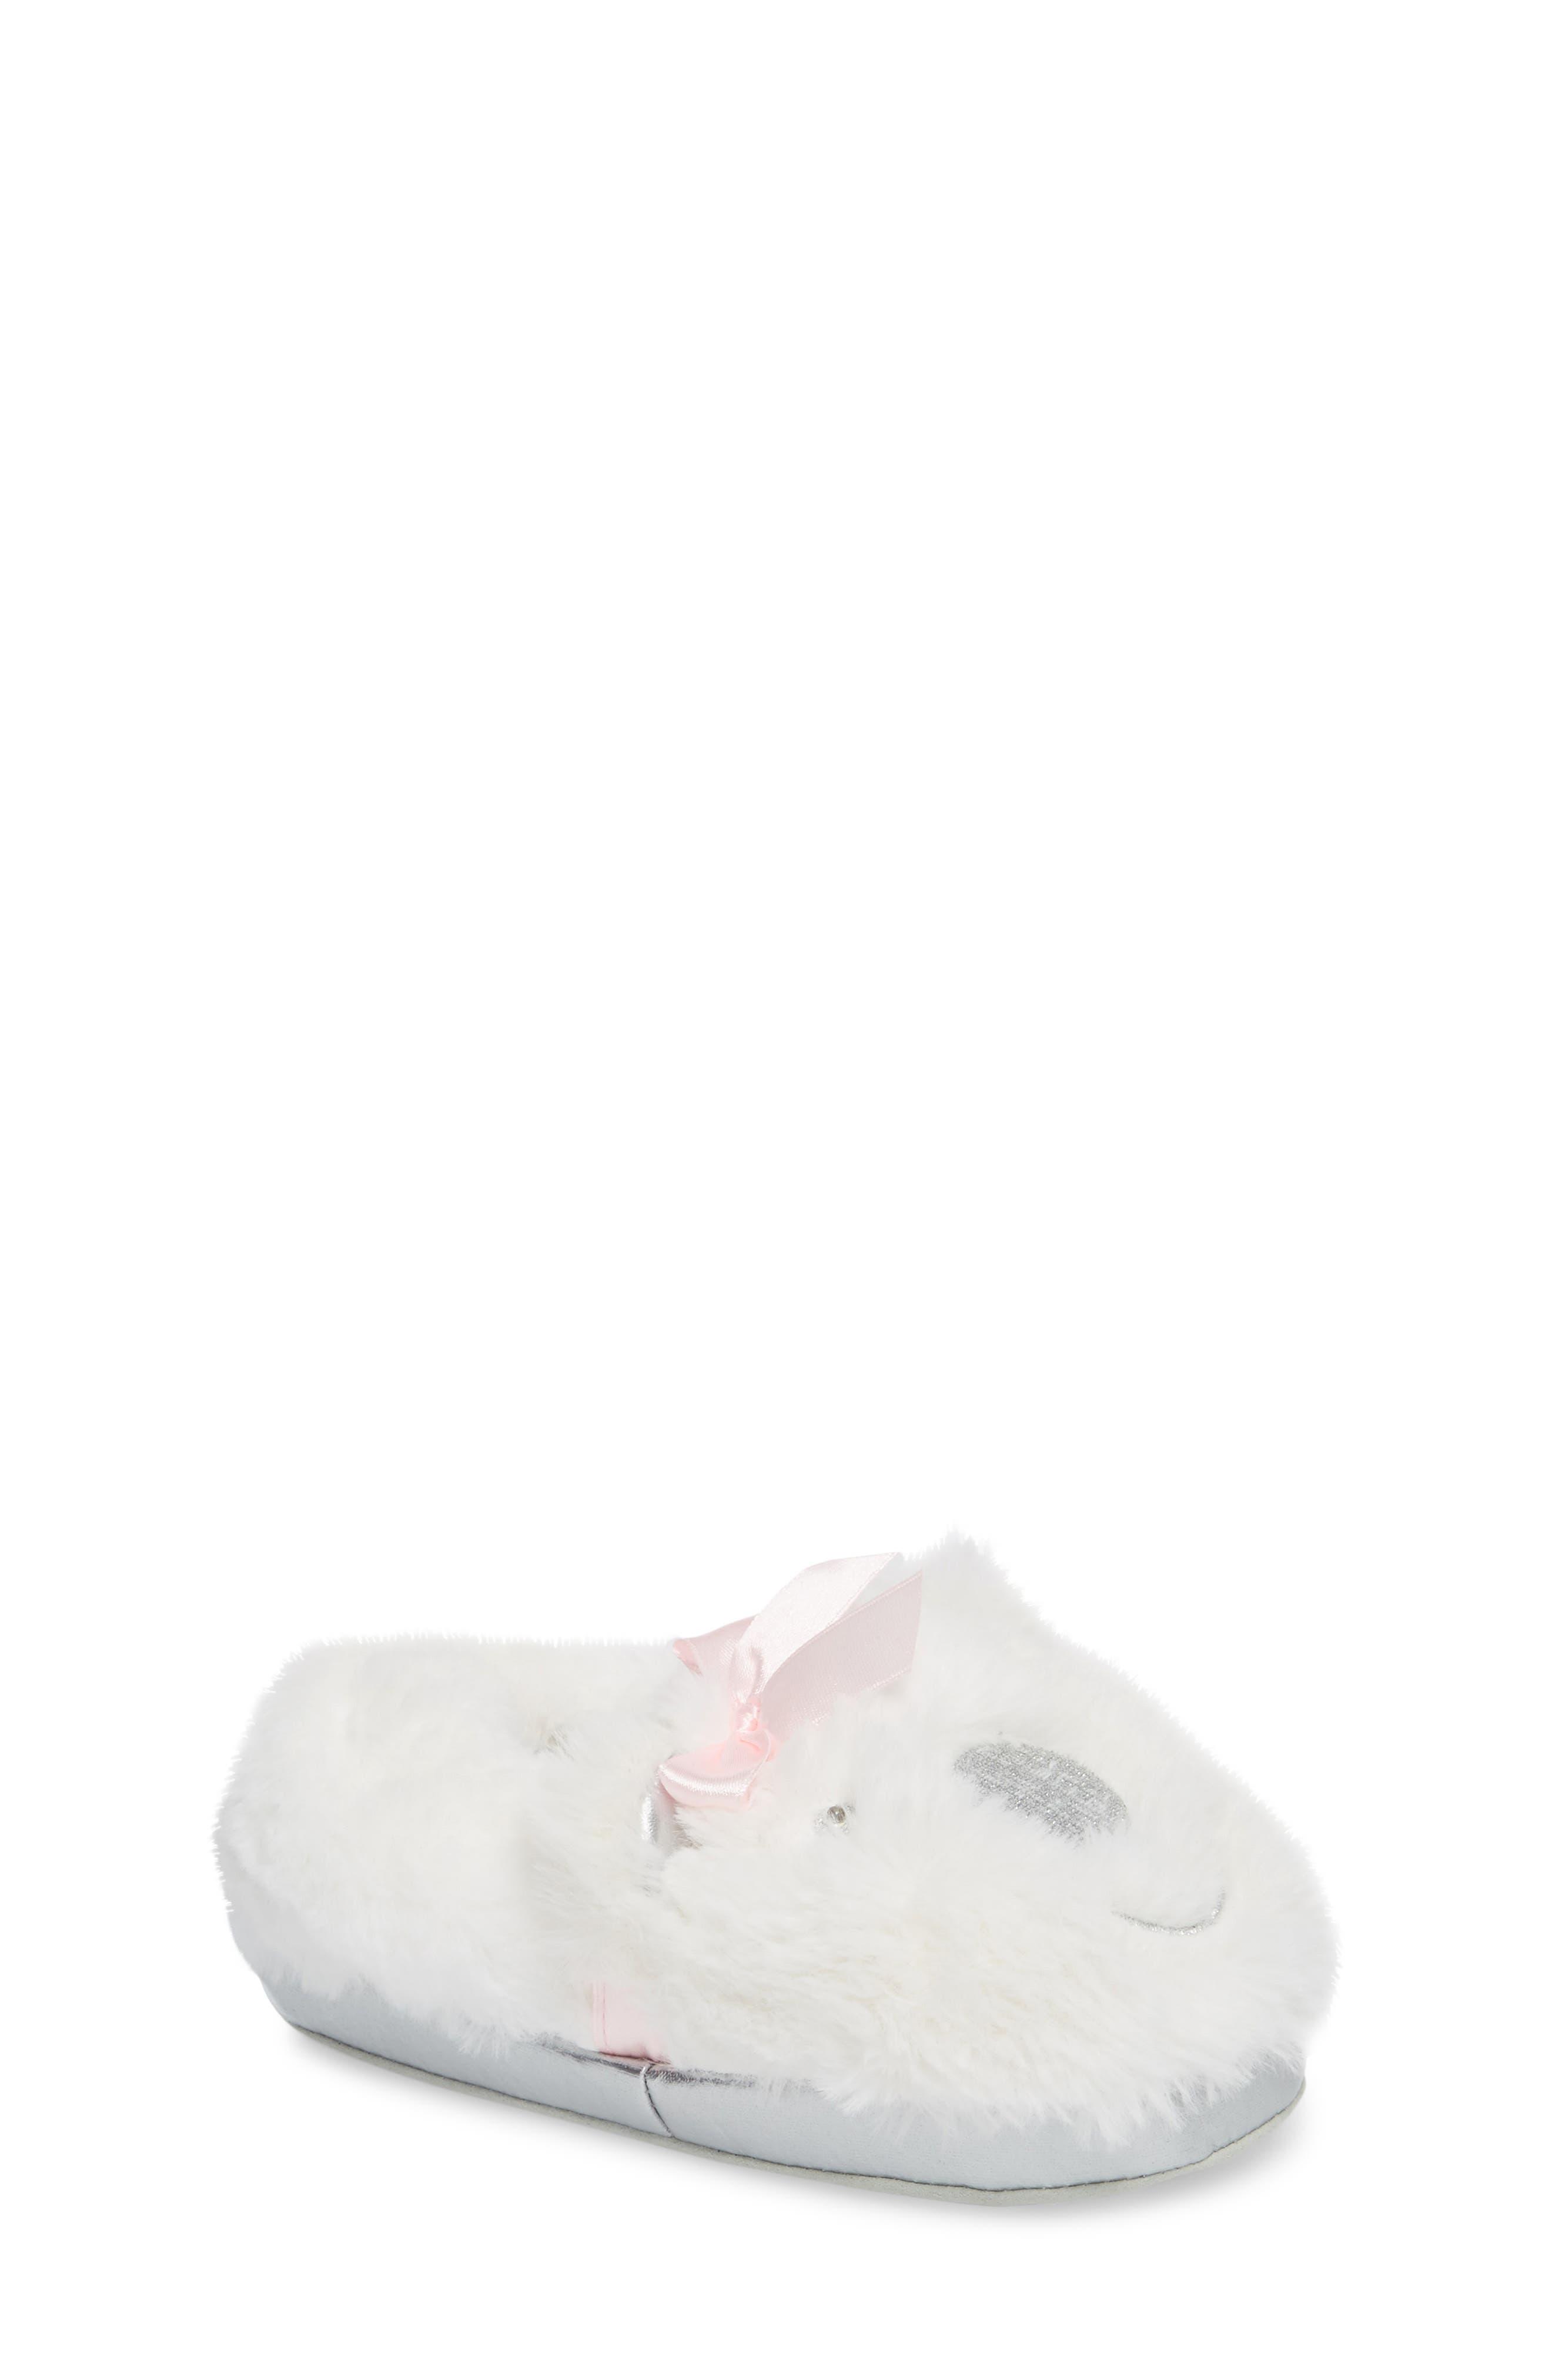 Alternate Image 1 Selected - Trimfit Light-Up Faux Fur Polar Bear Slipper (Toddler & Little Kid)